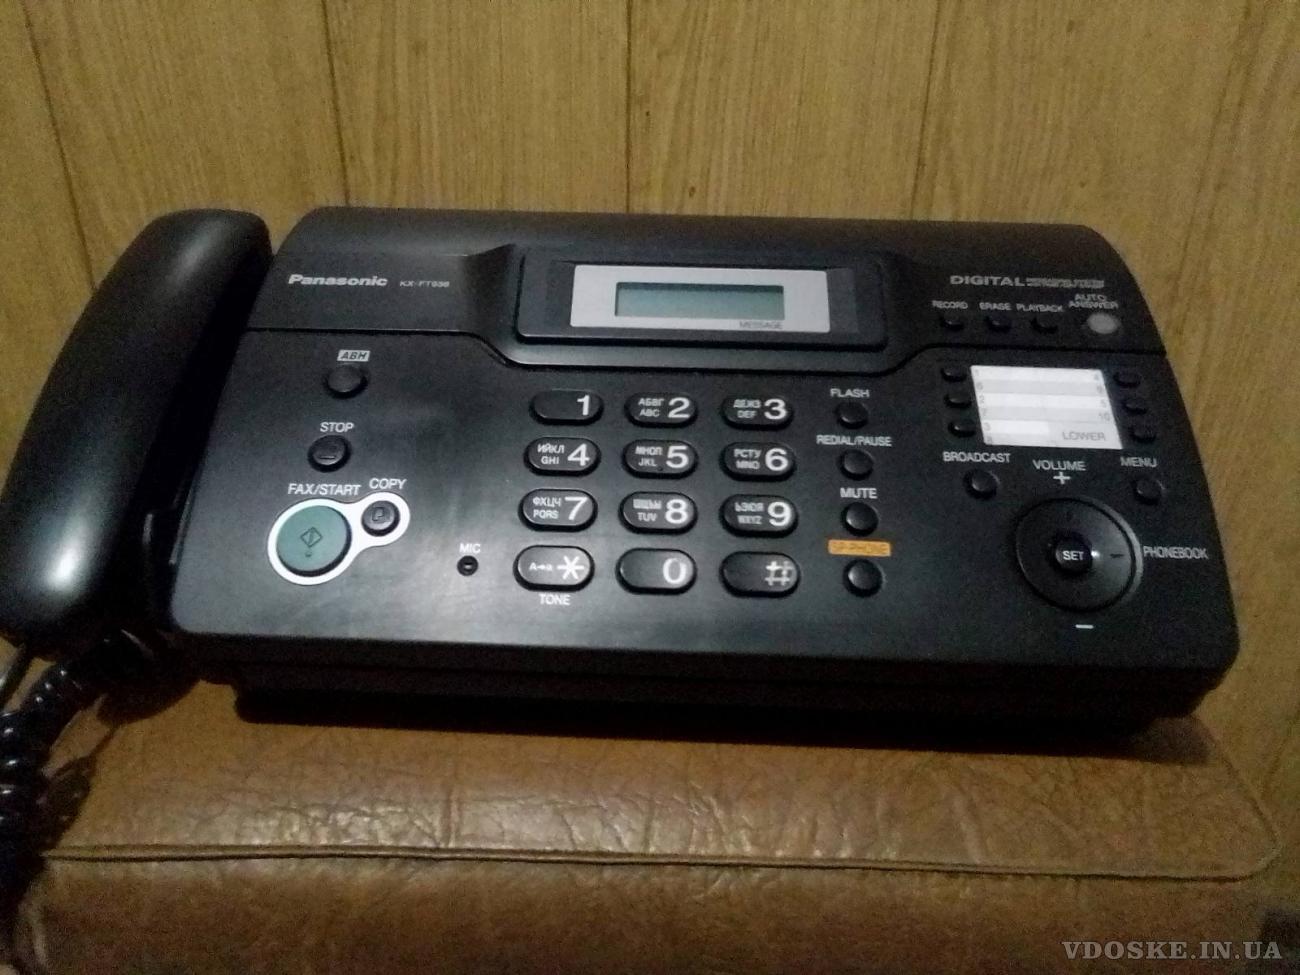 Телефон/факс Panasonic KX-FT938.